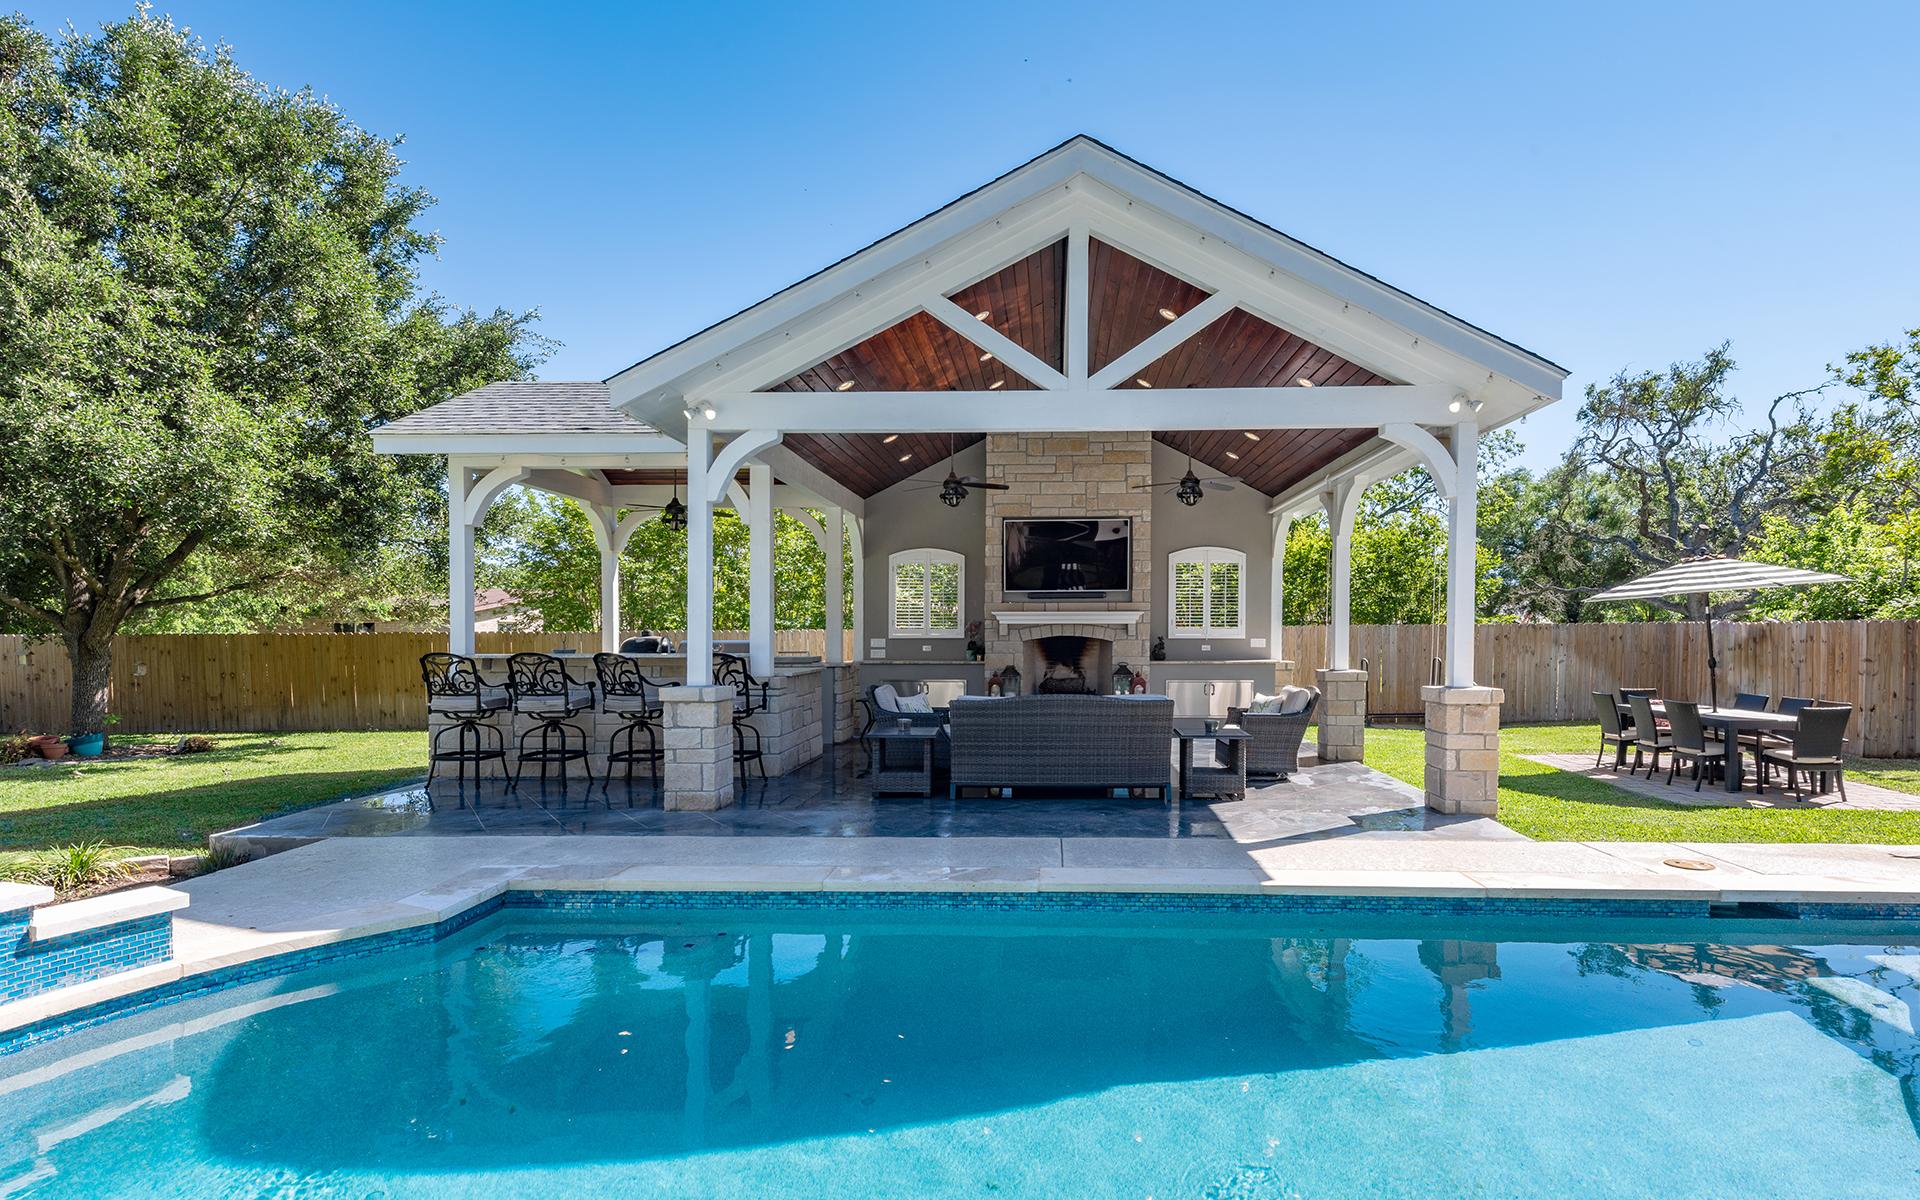 Pool House - Pool View